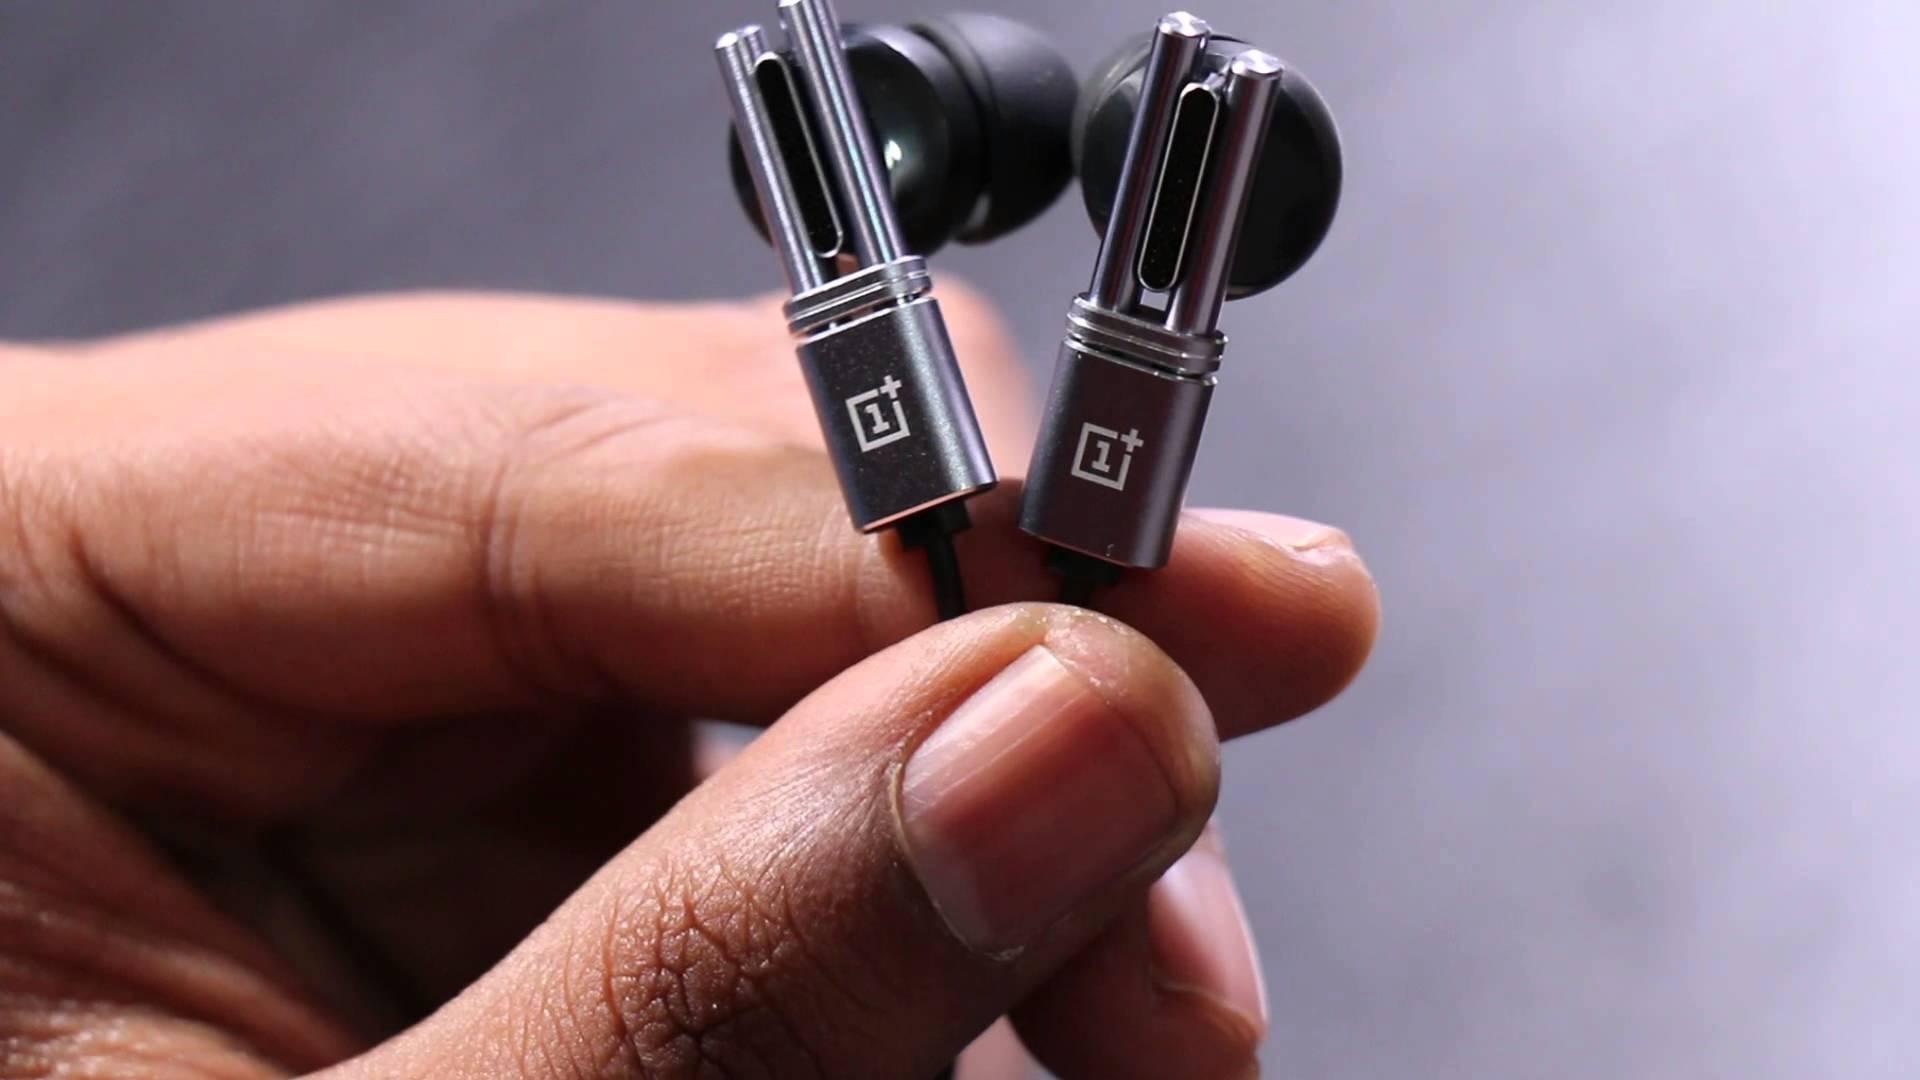 OnePlus Bullets Wireless headphones might launch alongside OnePlus 6 1